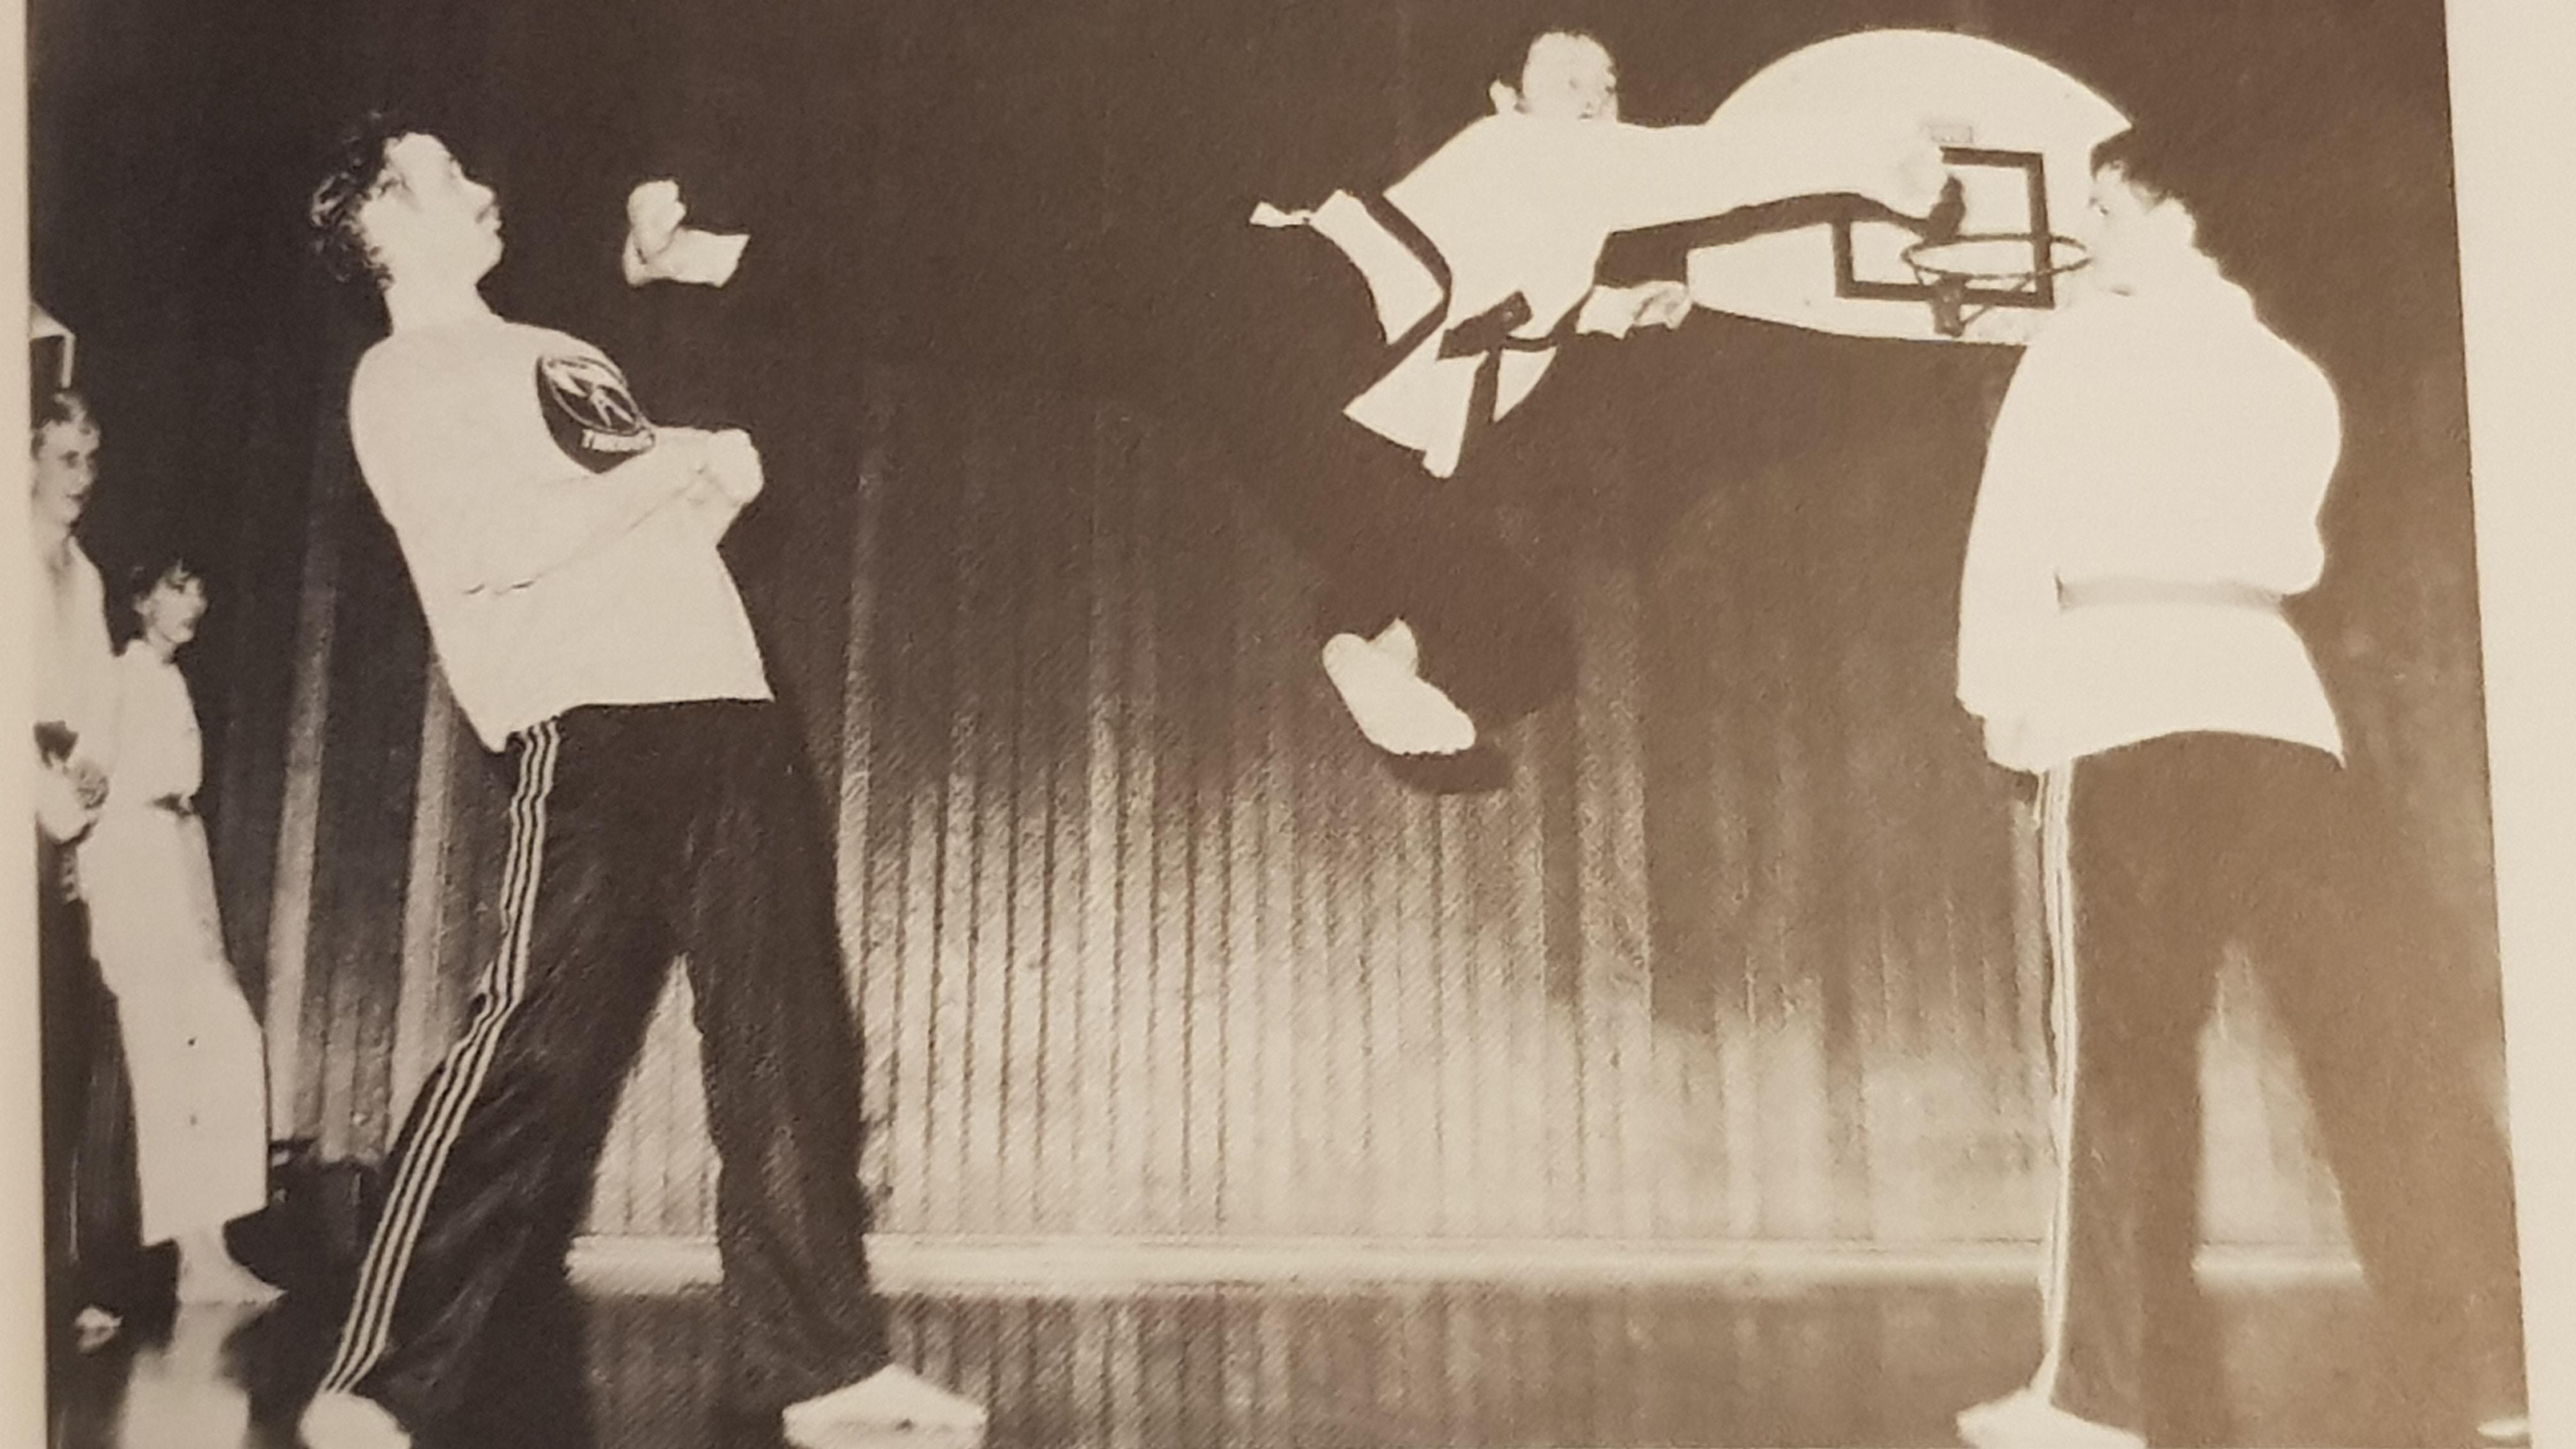 Harloff Taekwondo kampfsport Ansbach Selbstverteidigung